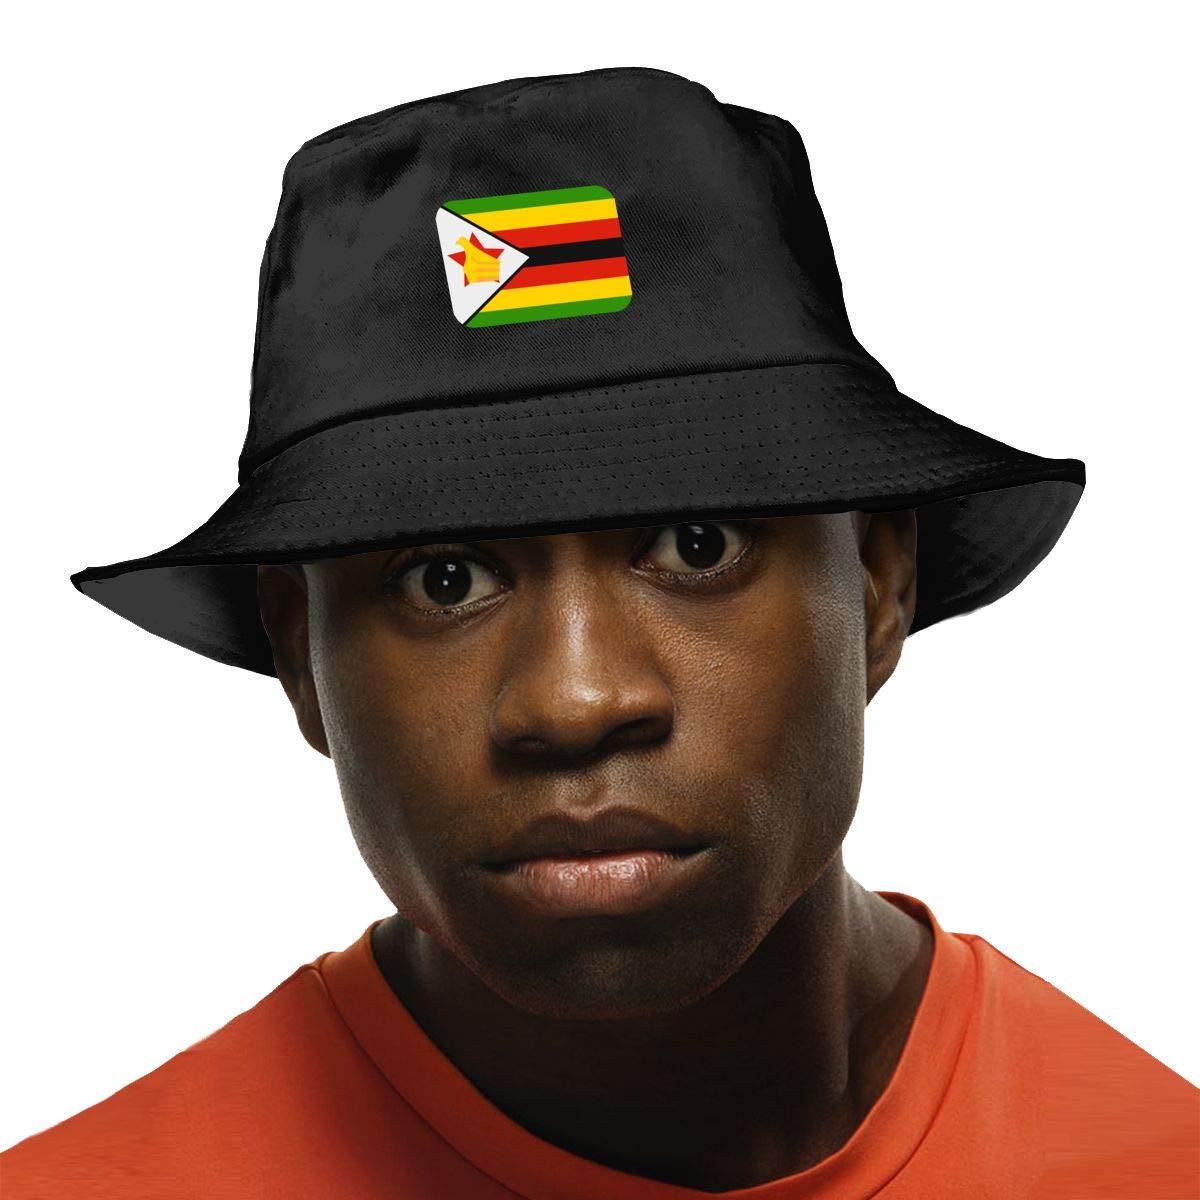 NDFGR Zimbabwe Unisex Cotton Packable Black Travel Bucket Hat Fishing Cap